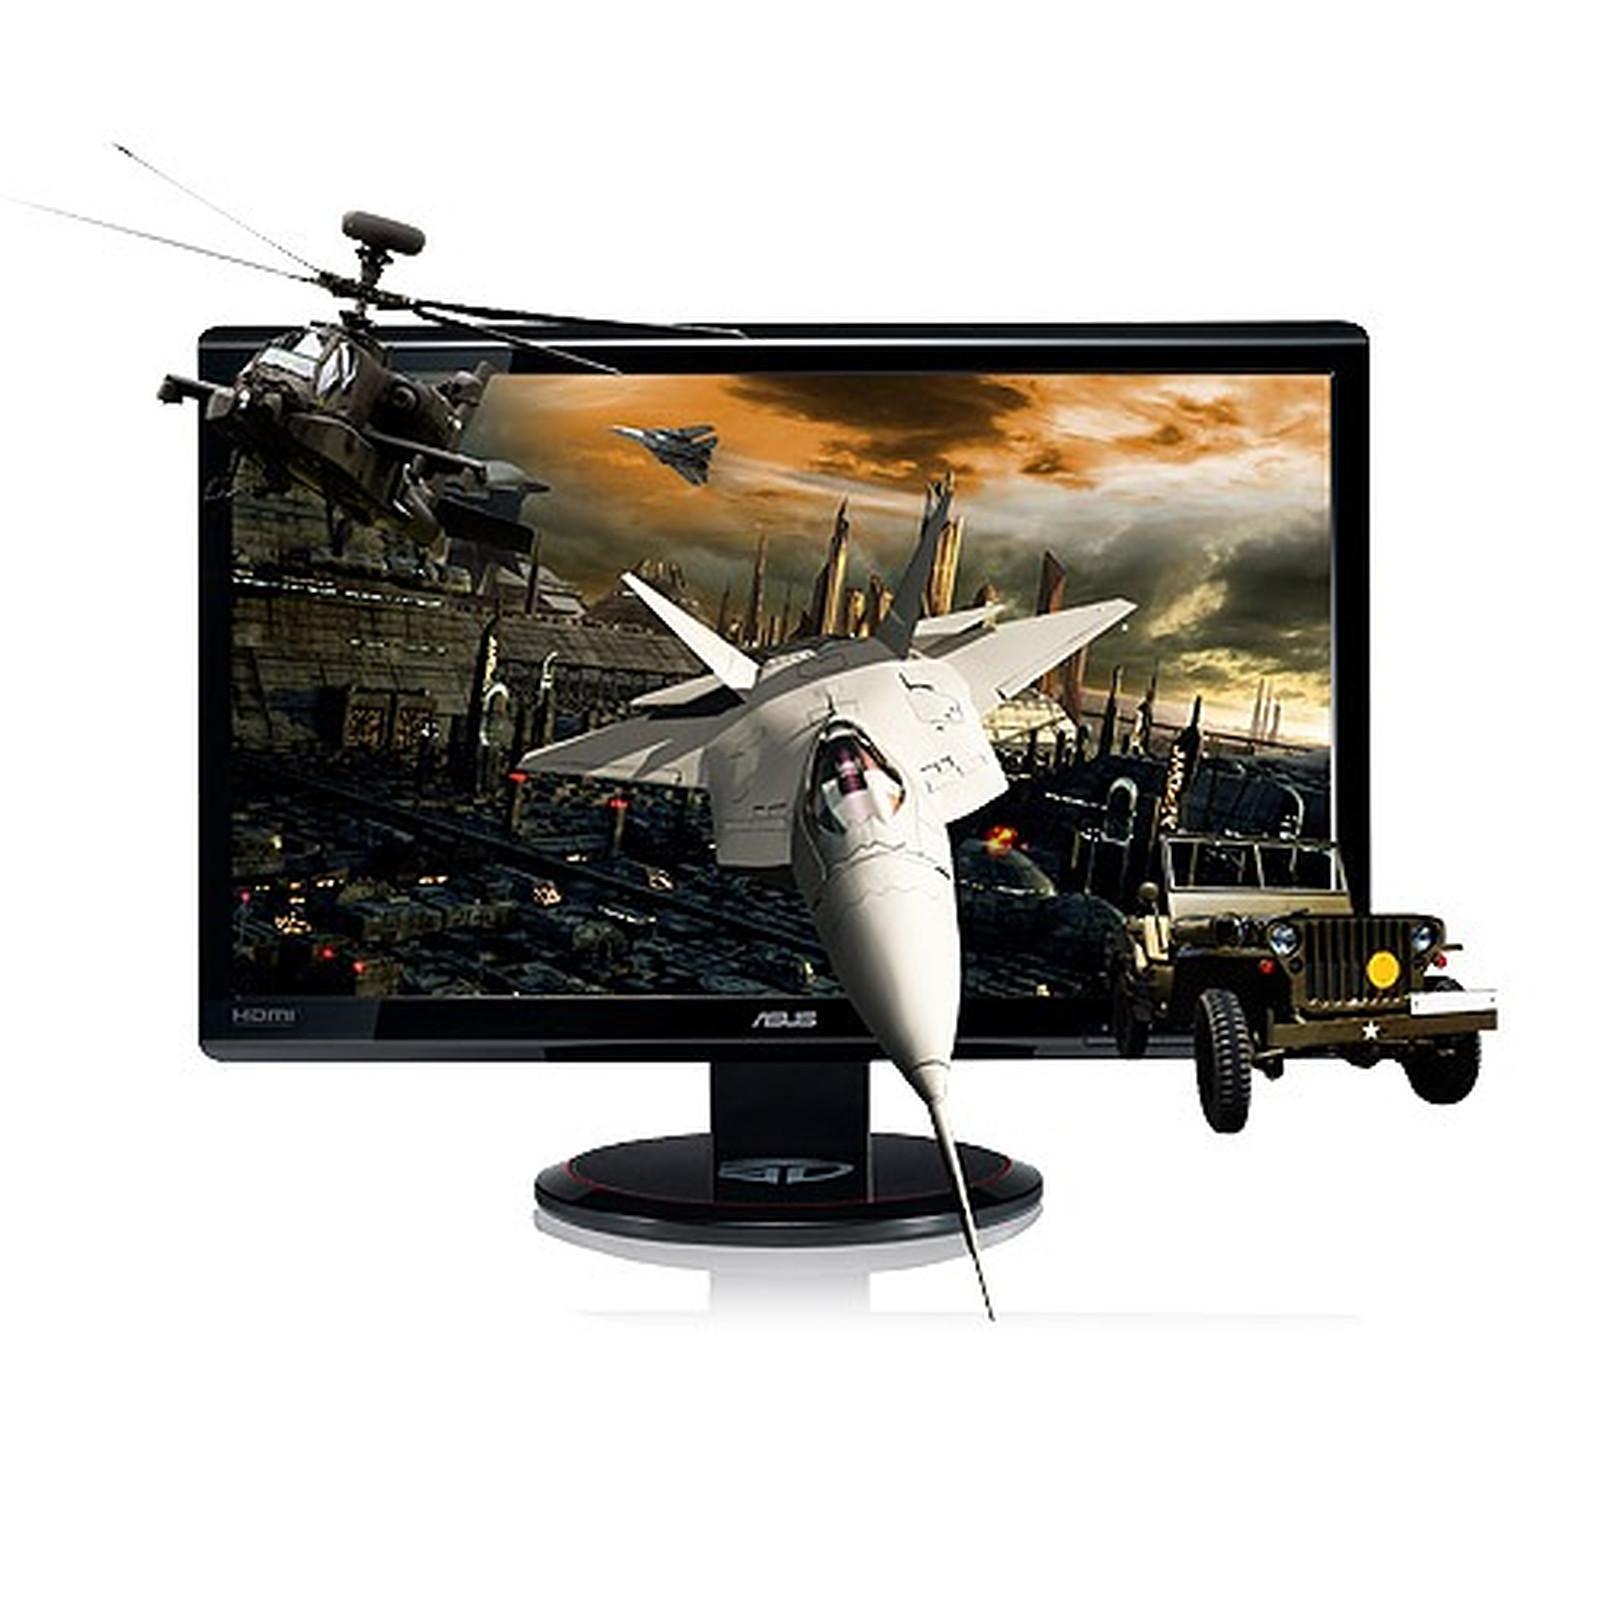 "ASUS 23"" LCD 3D - VG236HE"